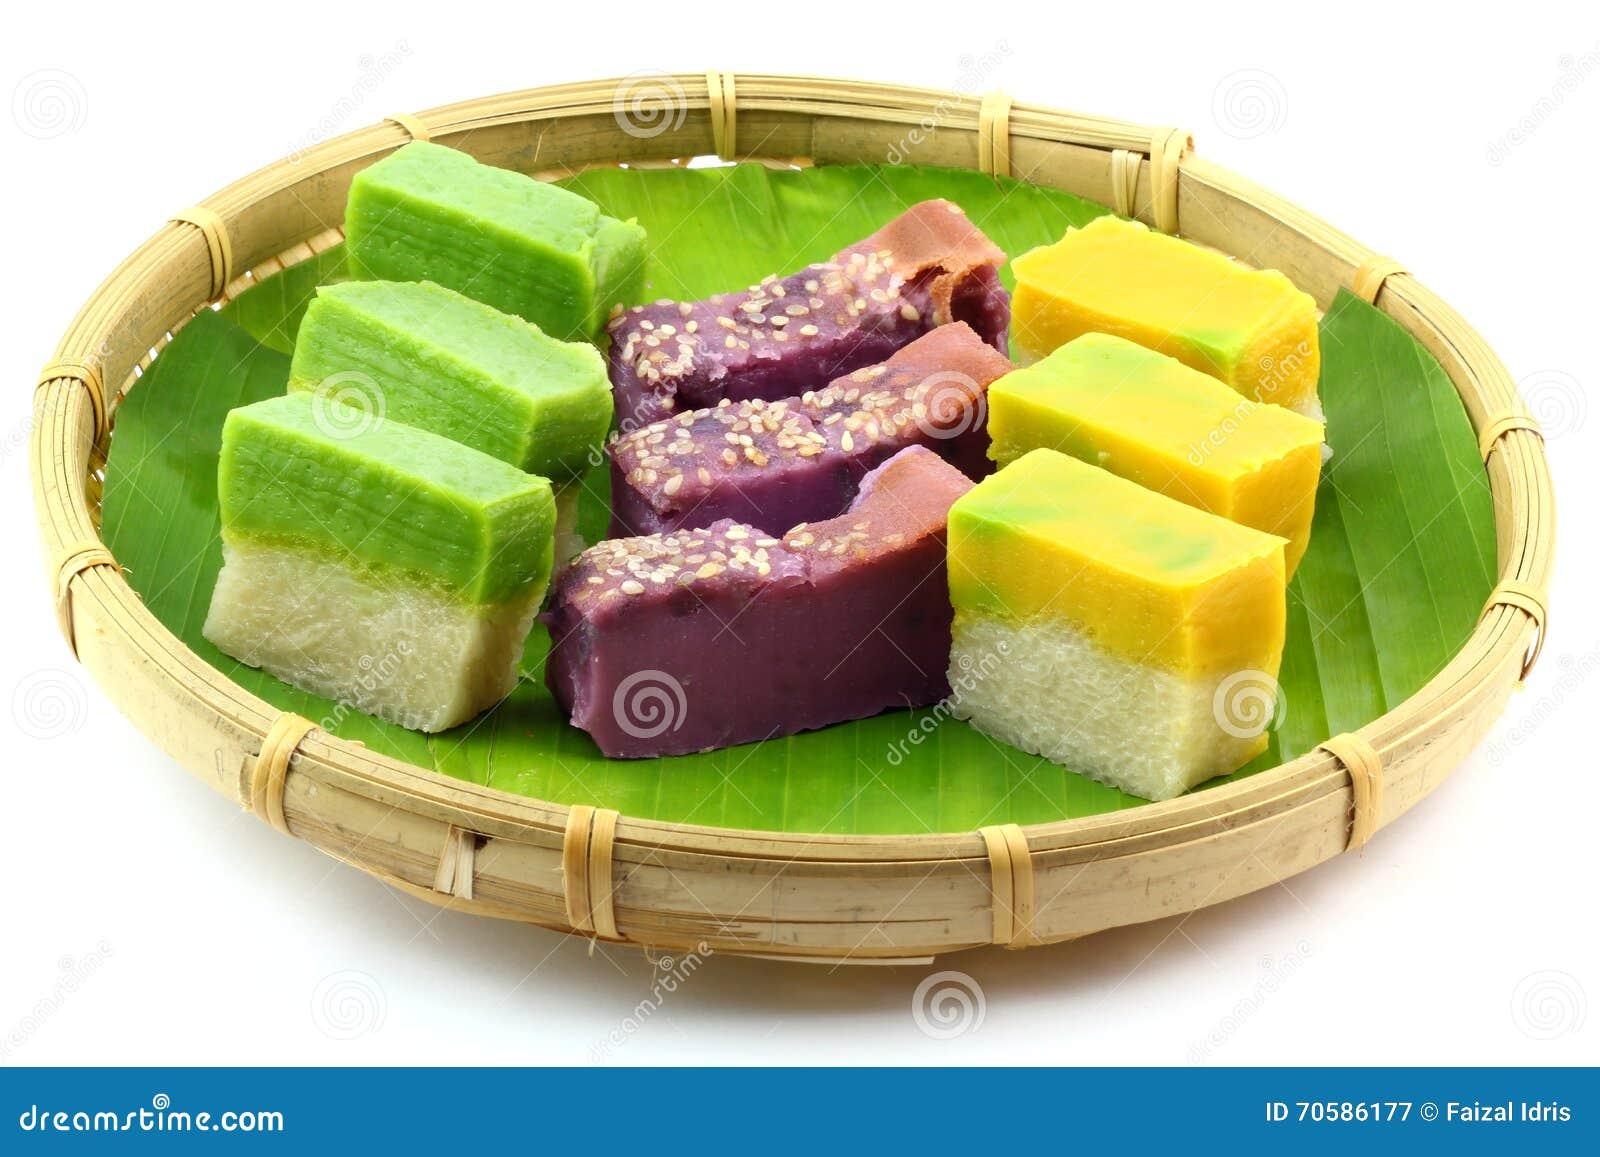 Cake Layer Tray